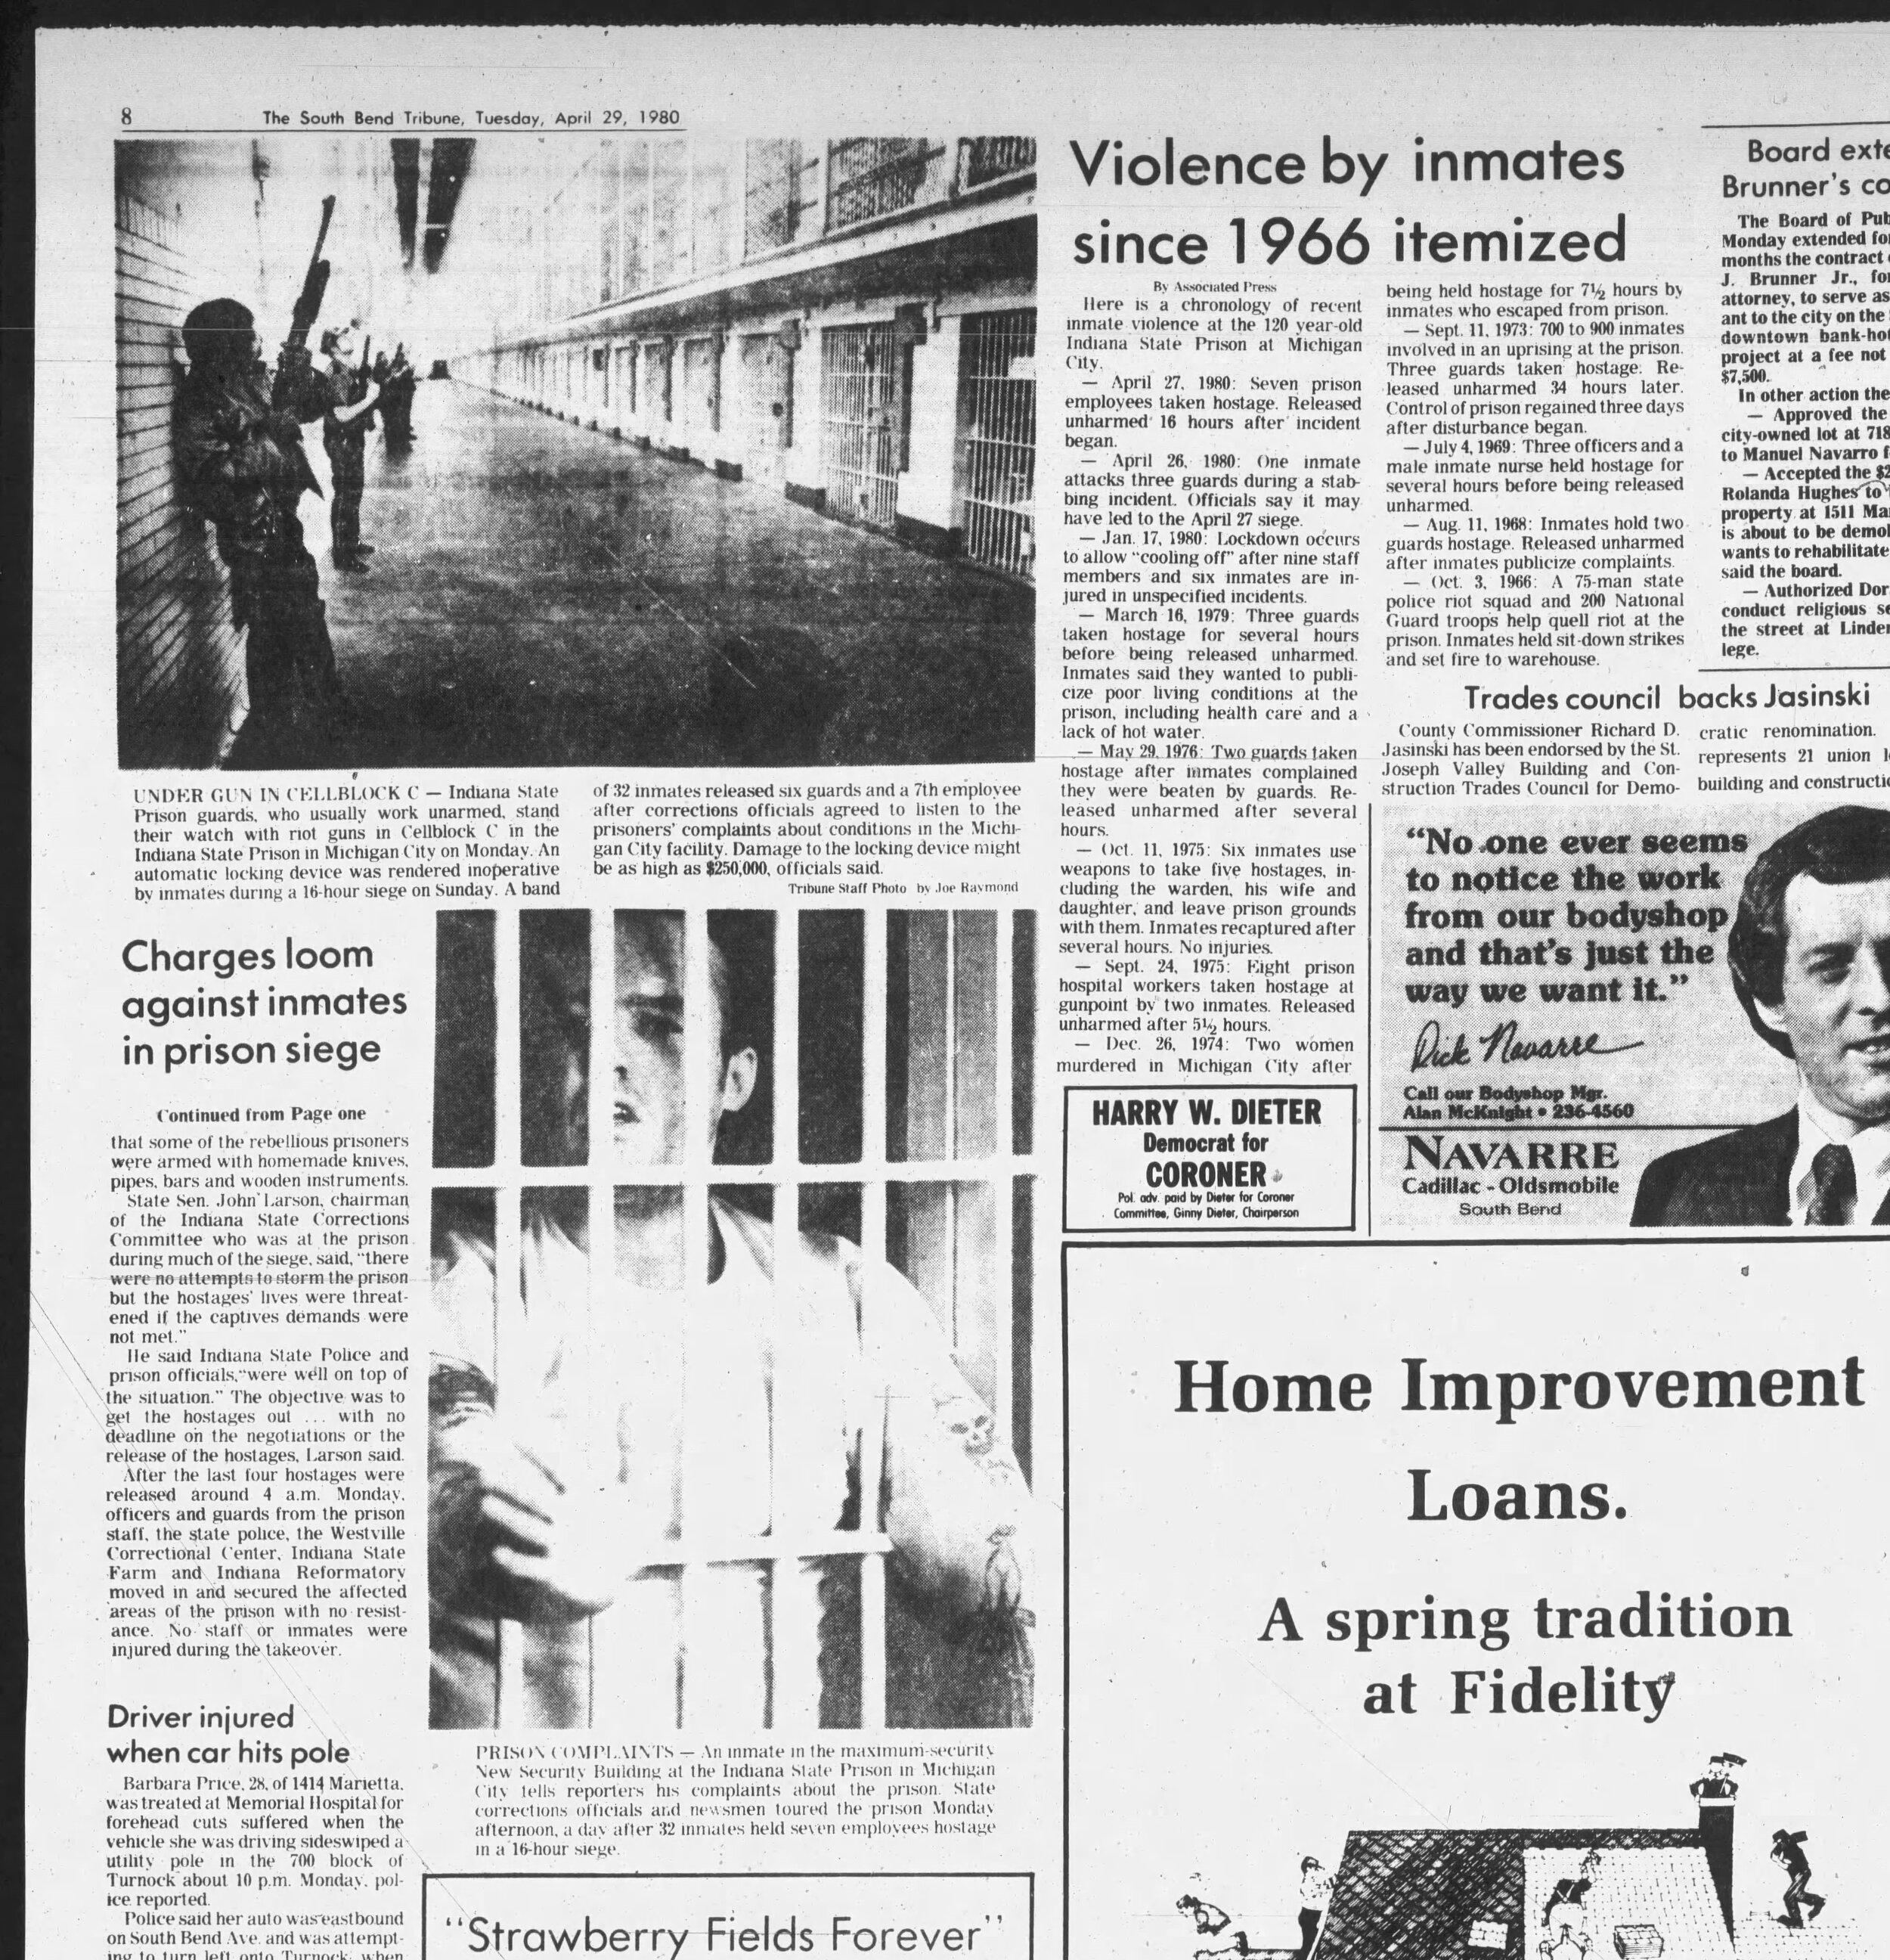 The_South_Bend_Tribune_Tue__Apr_29__1980_1.jpg